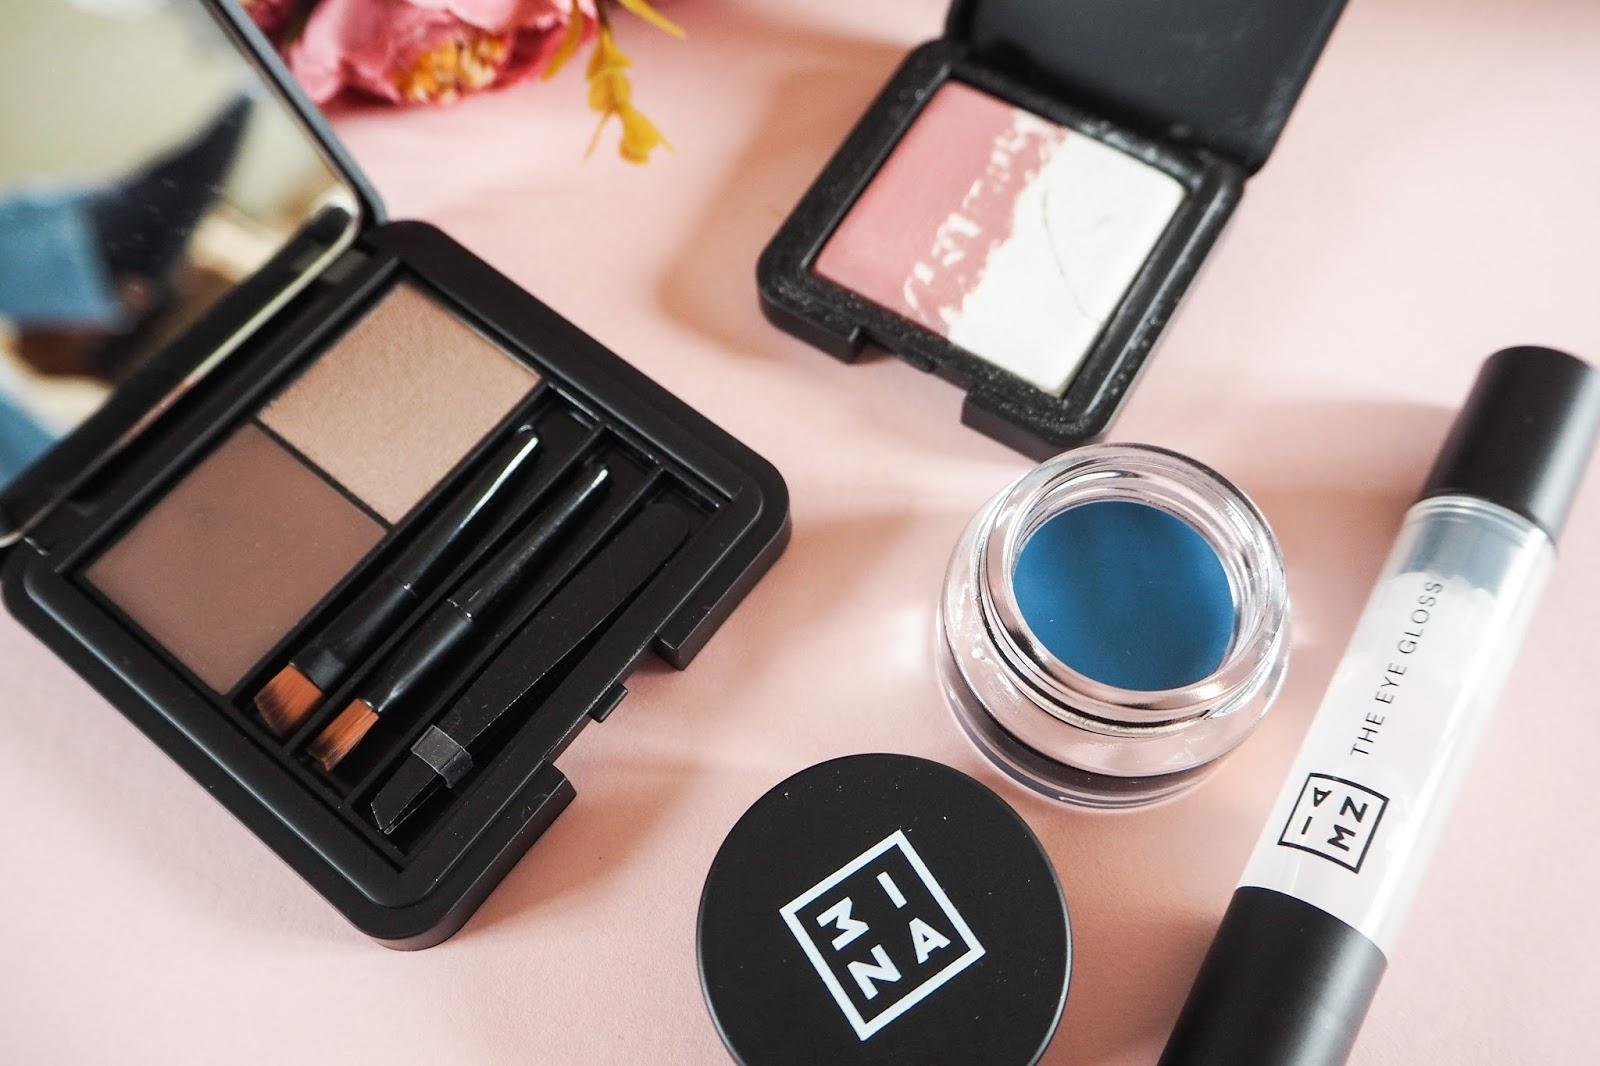 3INA Eye Gloss, Eyebrow Kit, Duo Eyeshadow and Gel Eyeliner Review